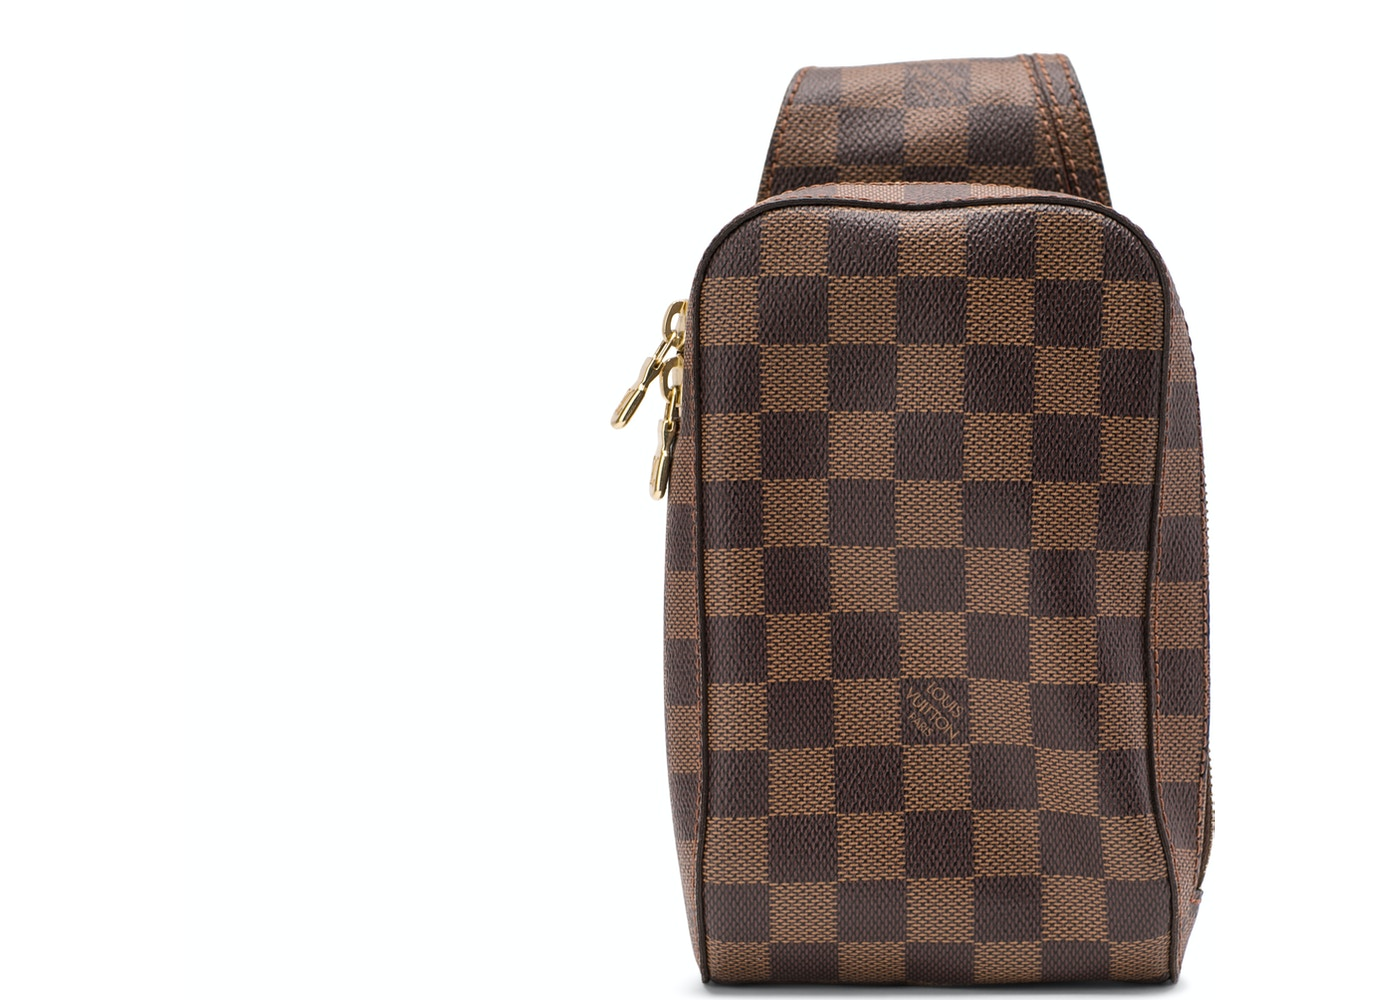 Louis Vuitton Geronimos Damier Ebene Brown 7b5a3f1feb27a